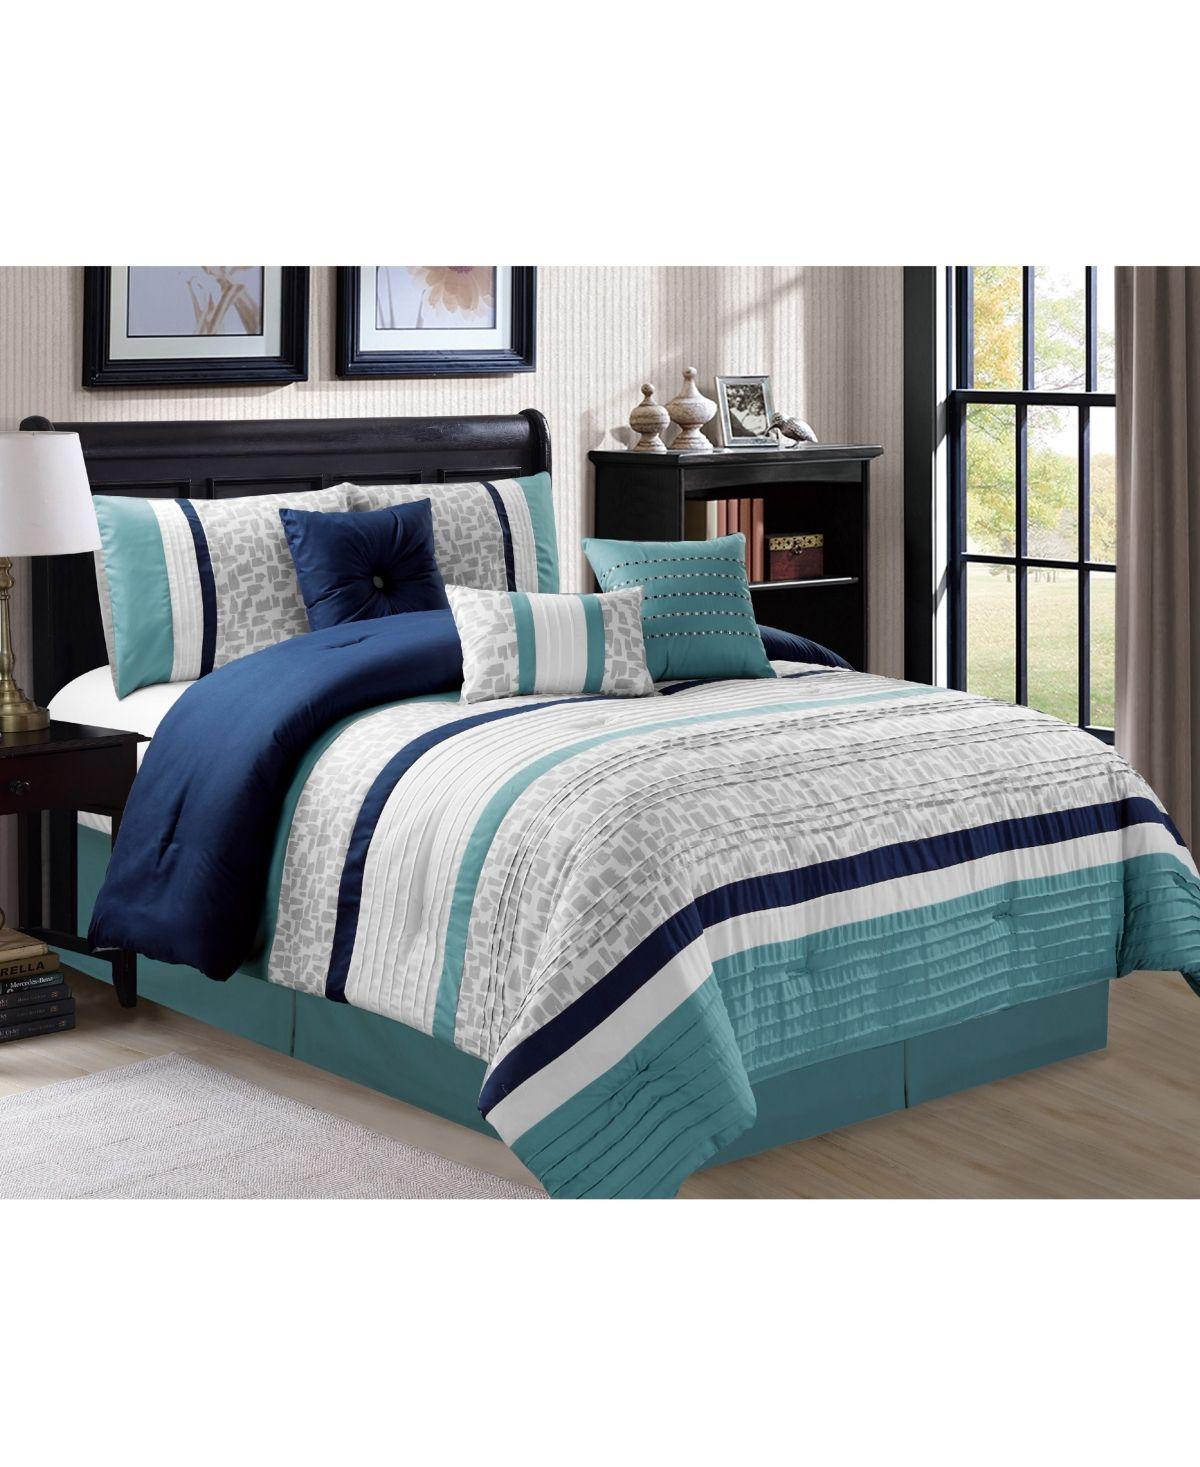 Luxlen Hunley 7 Piece Comforter Set, Cal King & Reviews